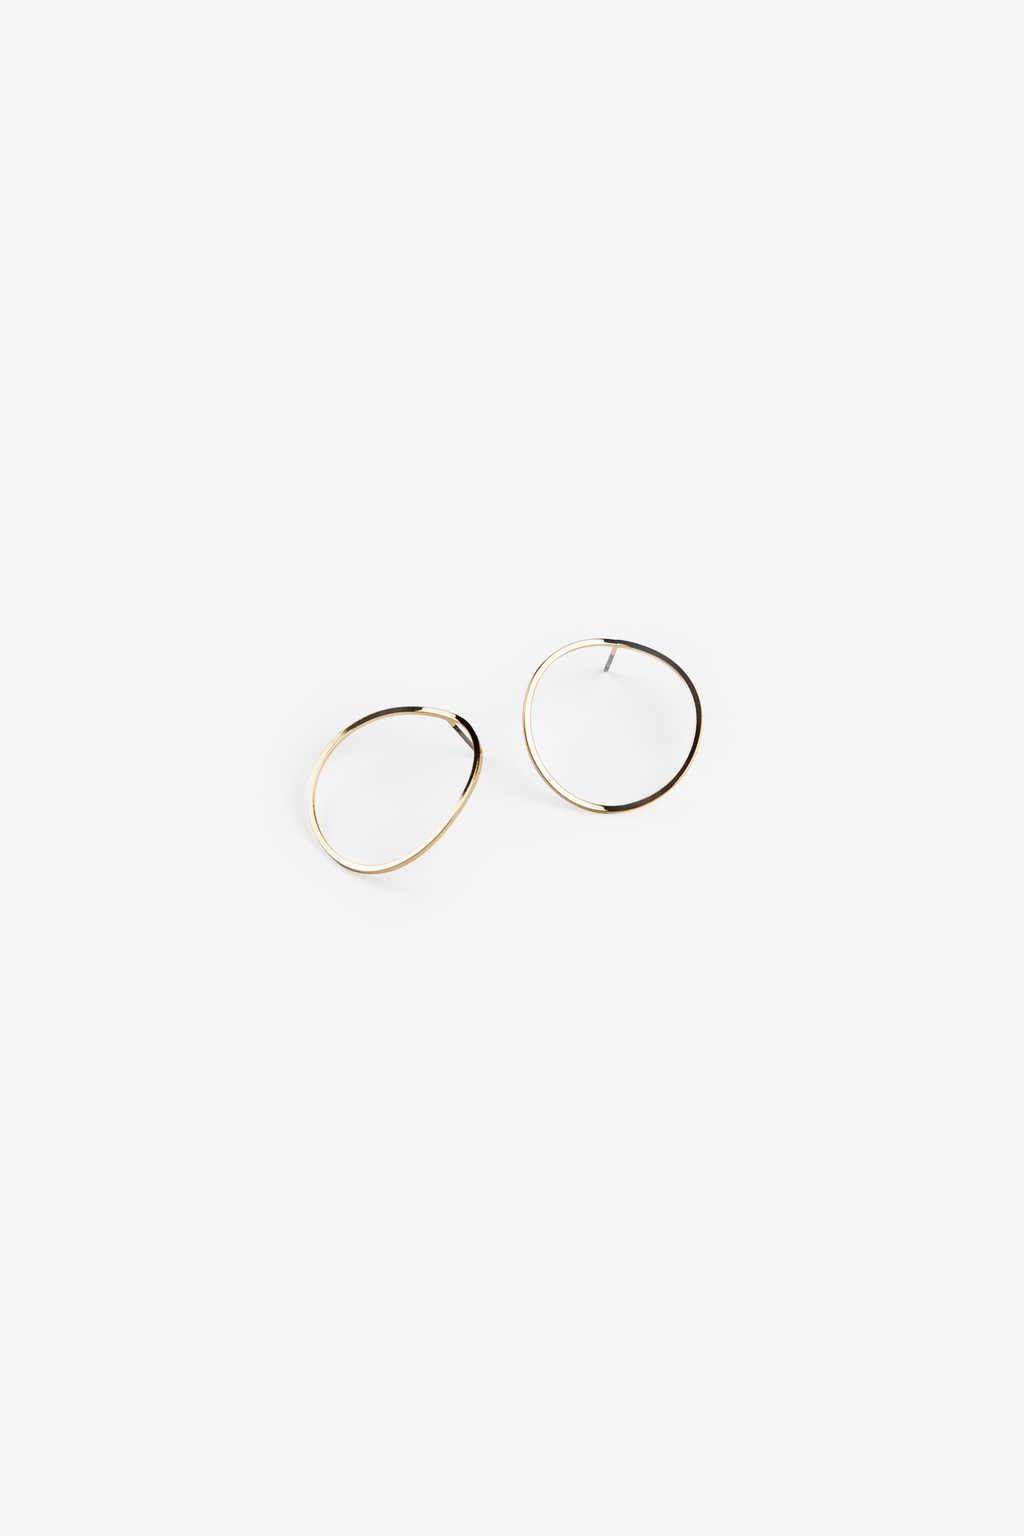 Earring H150 Gold 1